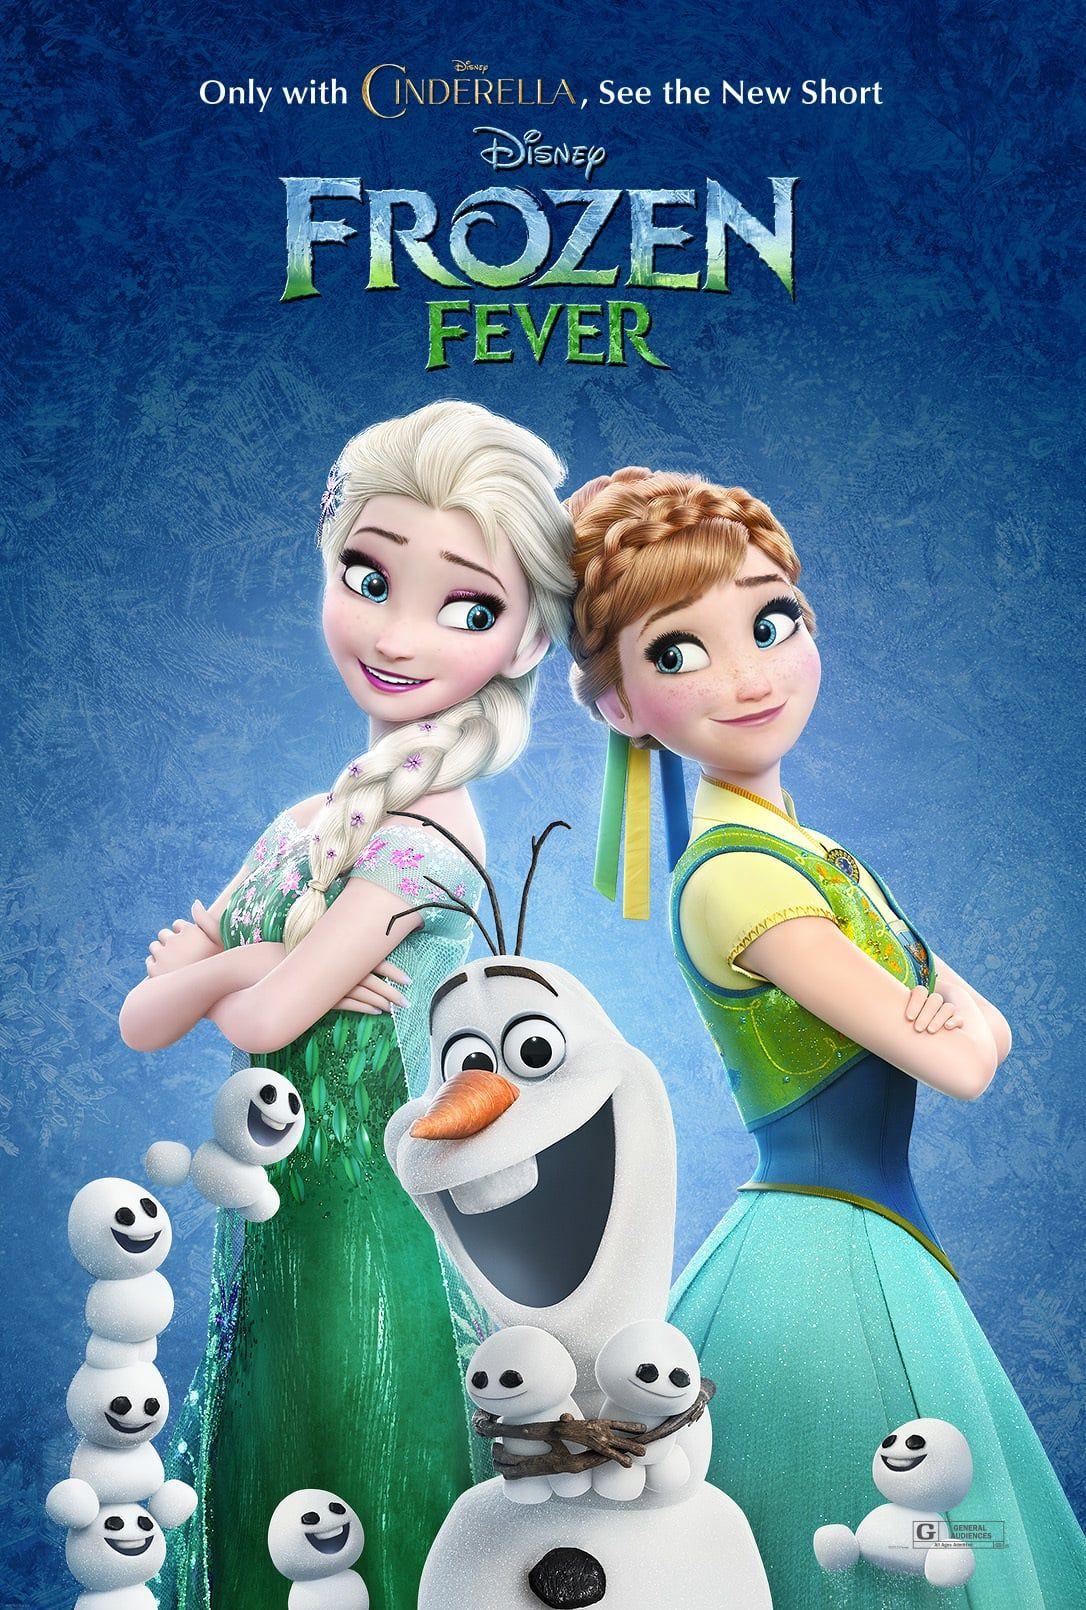 Watch Frozen Fever Full Movie 2015 Online Free Putlockers Frozen Fever Movie Frozen Fever 2015 Frozen Film